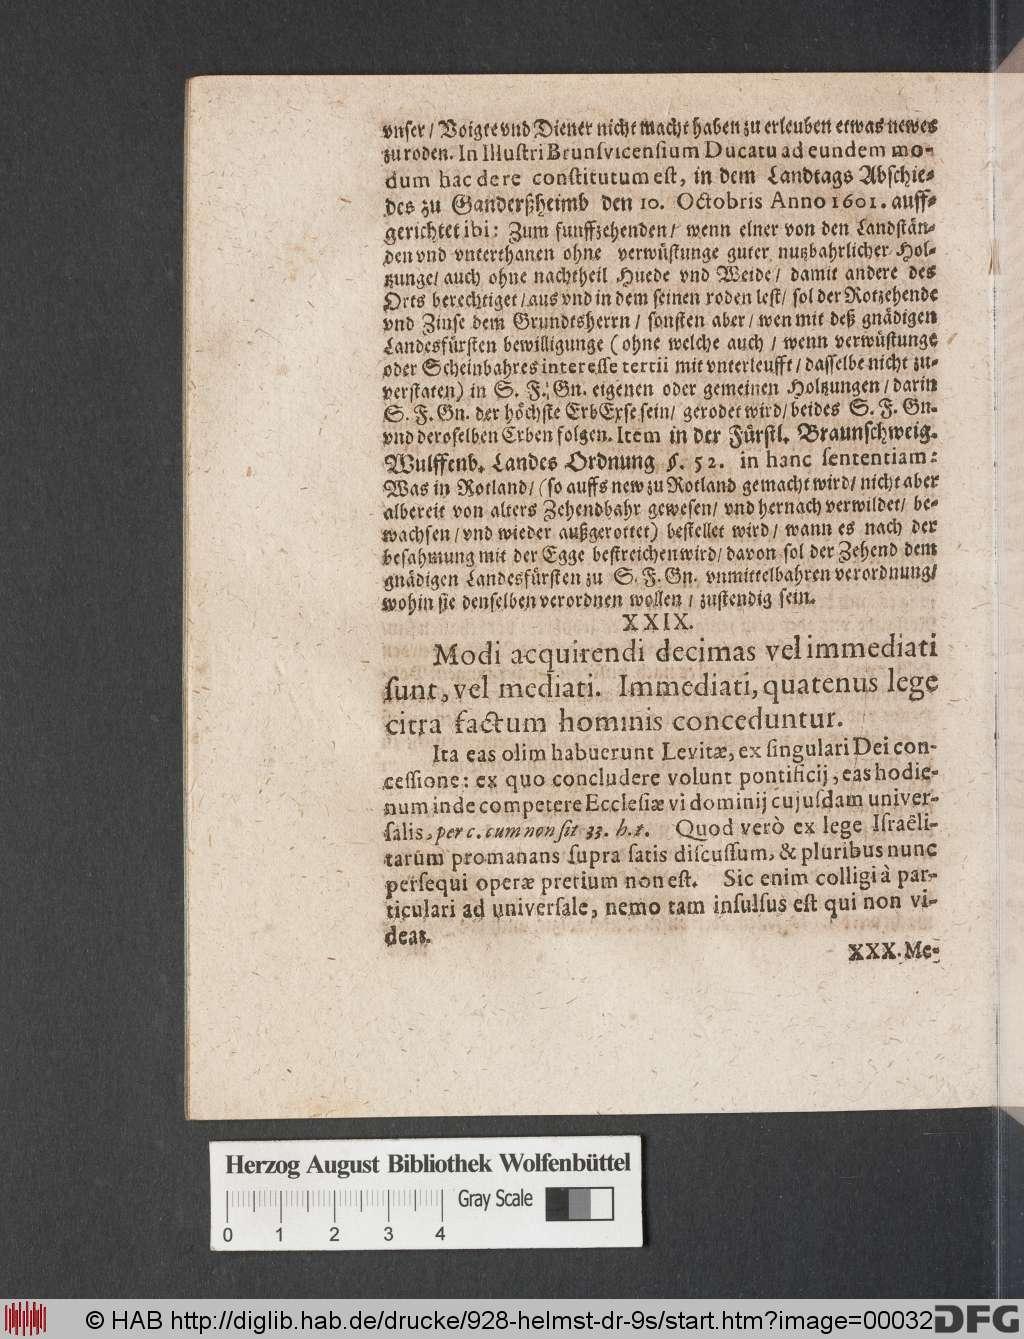 http://diglib.hab.de/drucke/928-helmst-dr-9s/00032.jpg